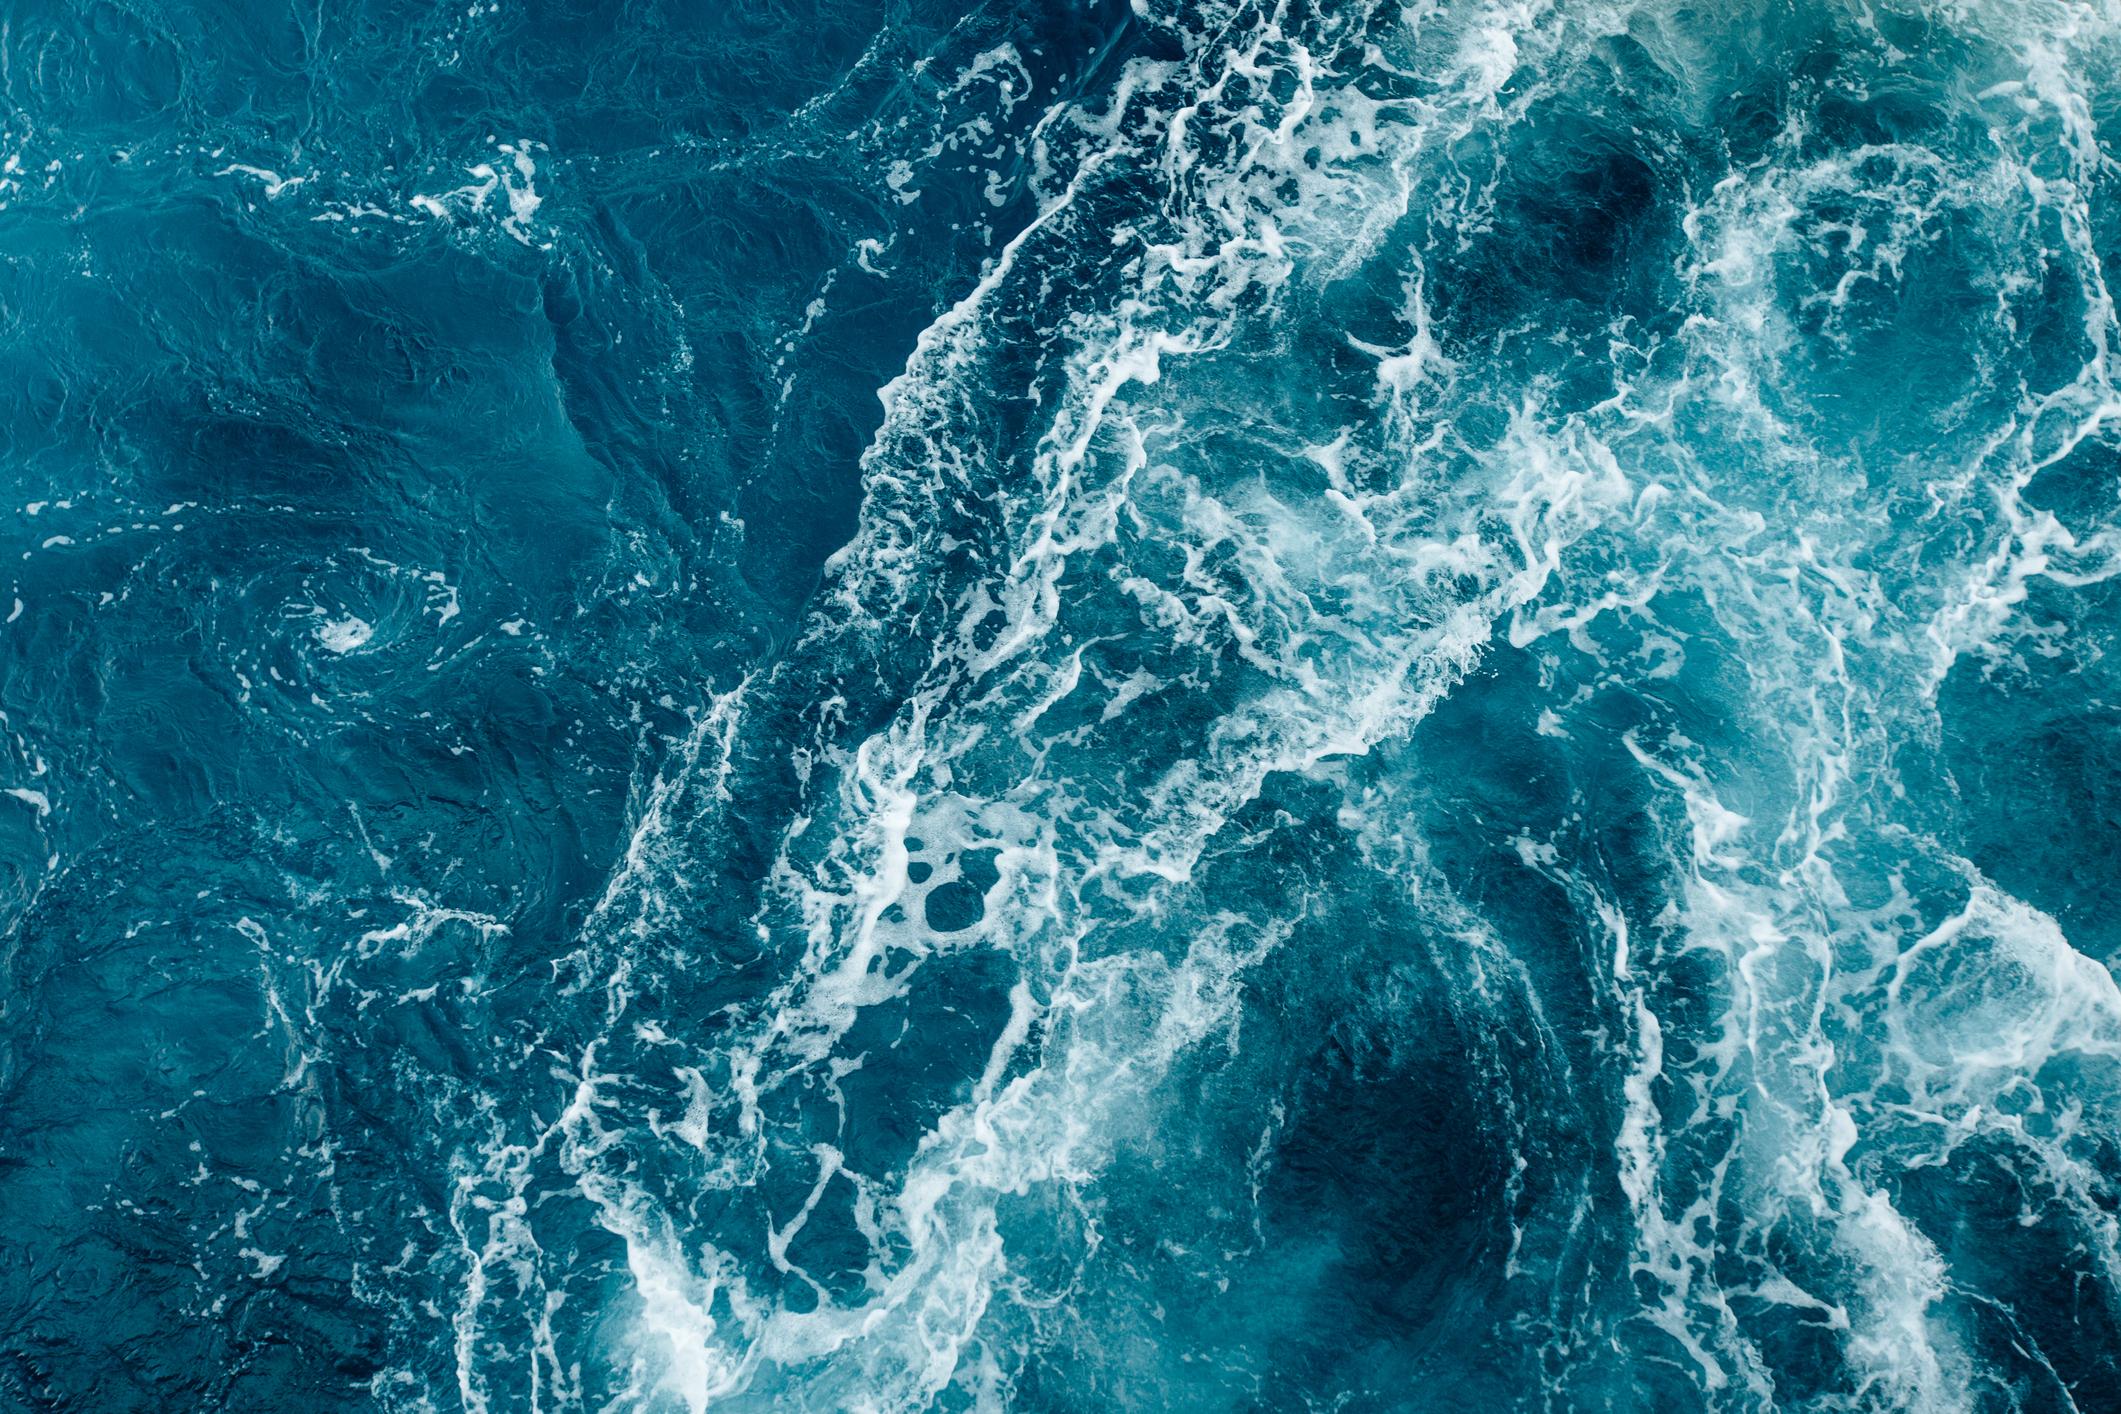 Wave formation of the adriatic sea ocean